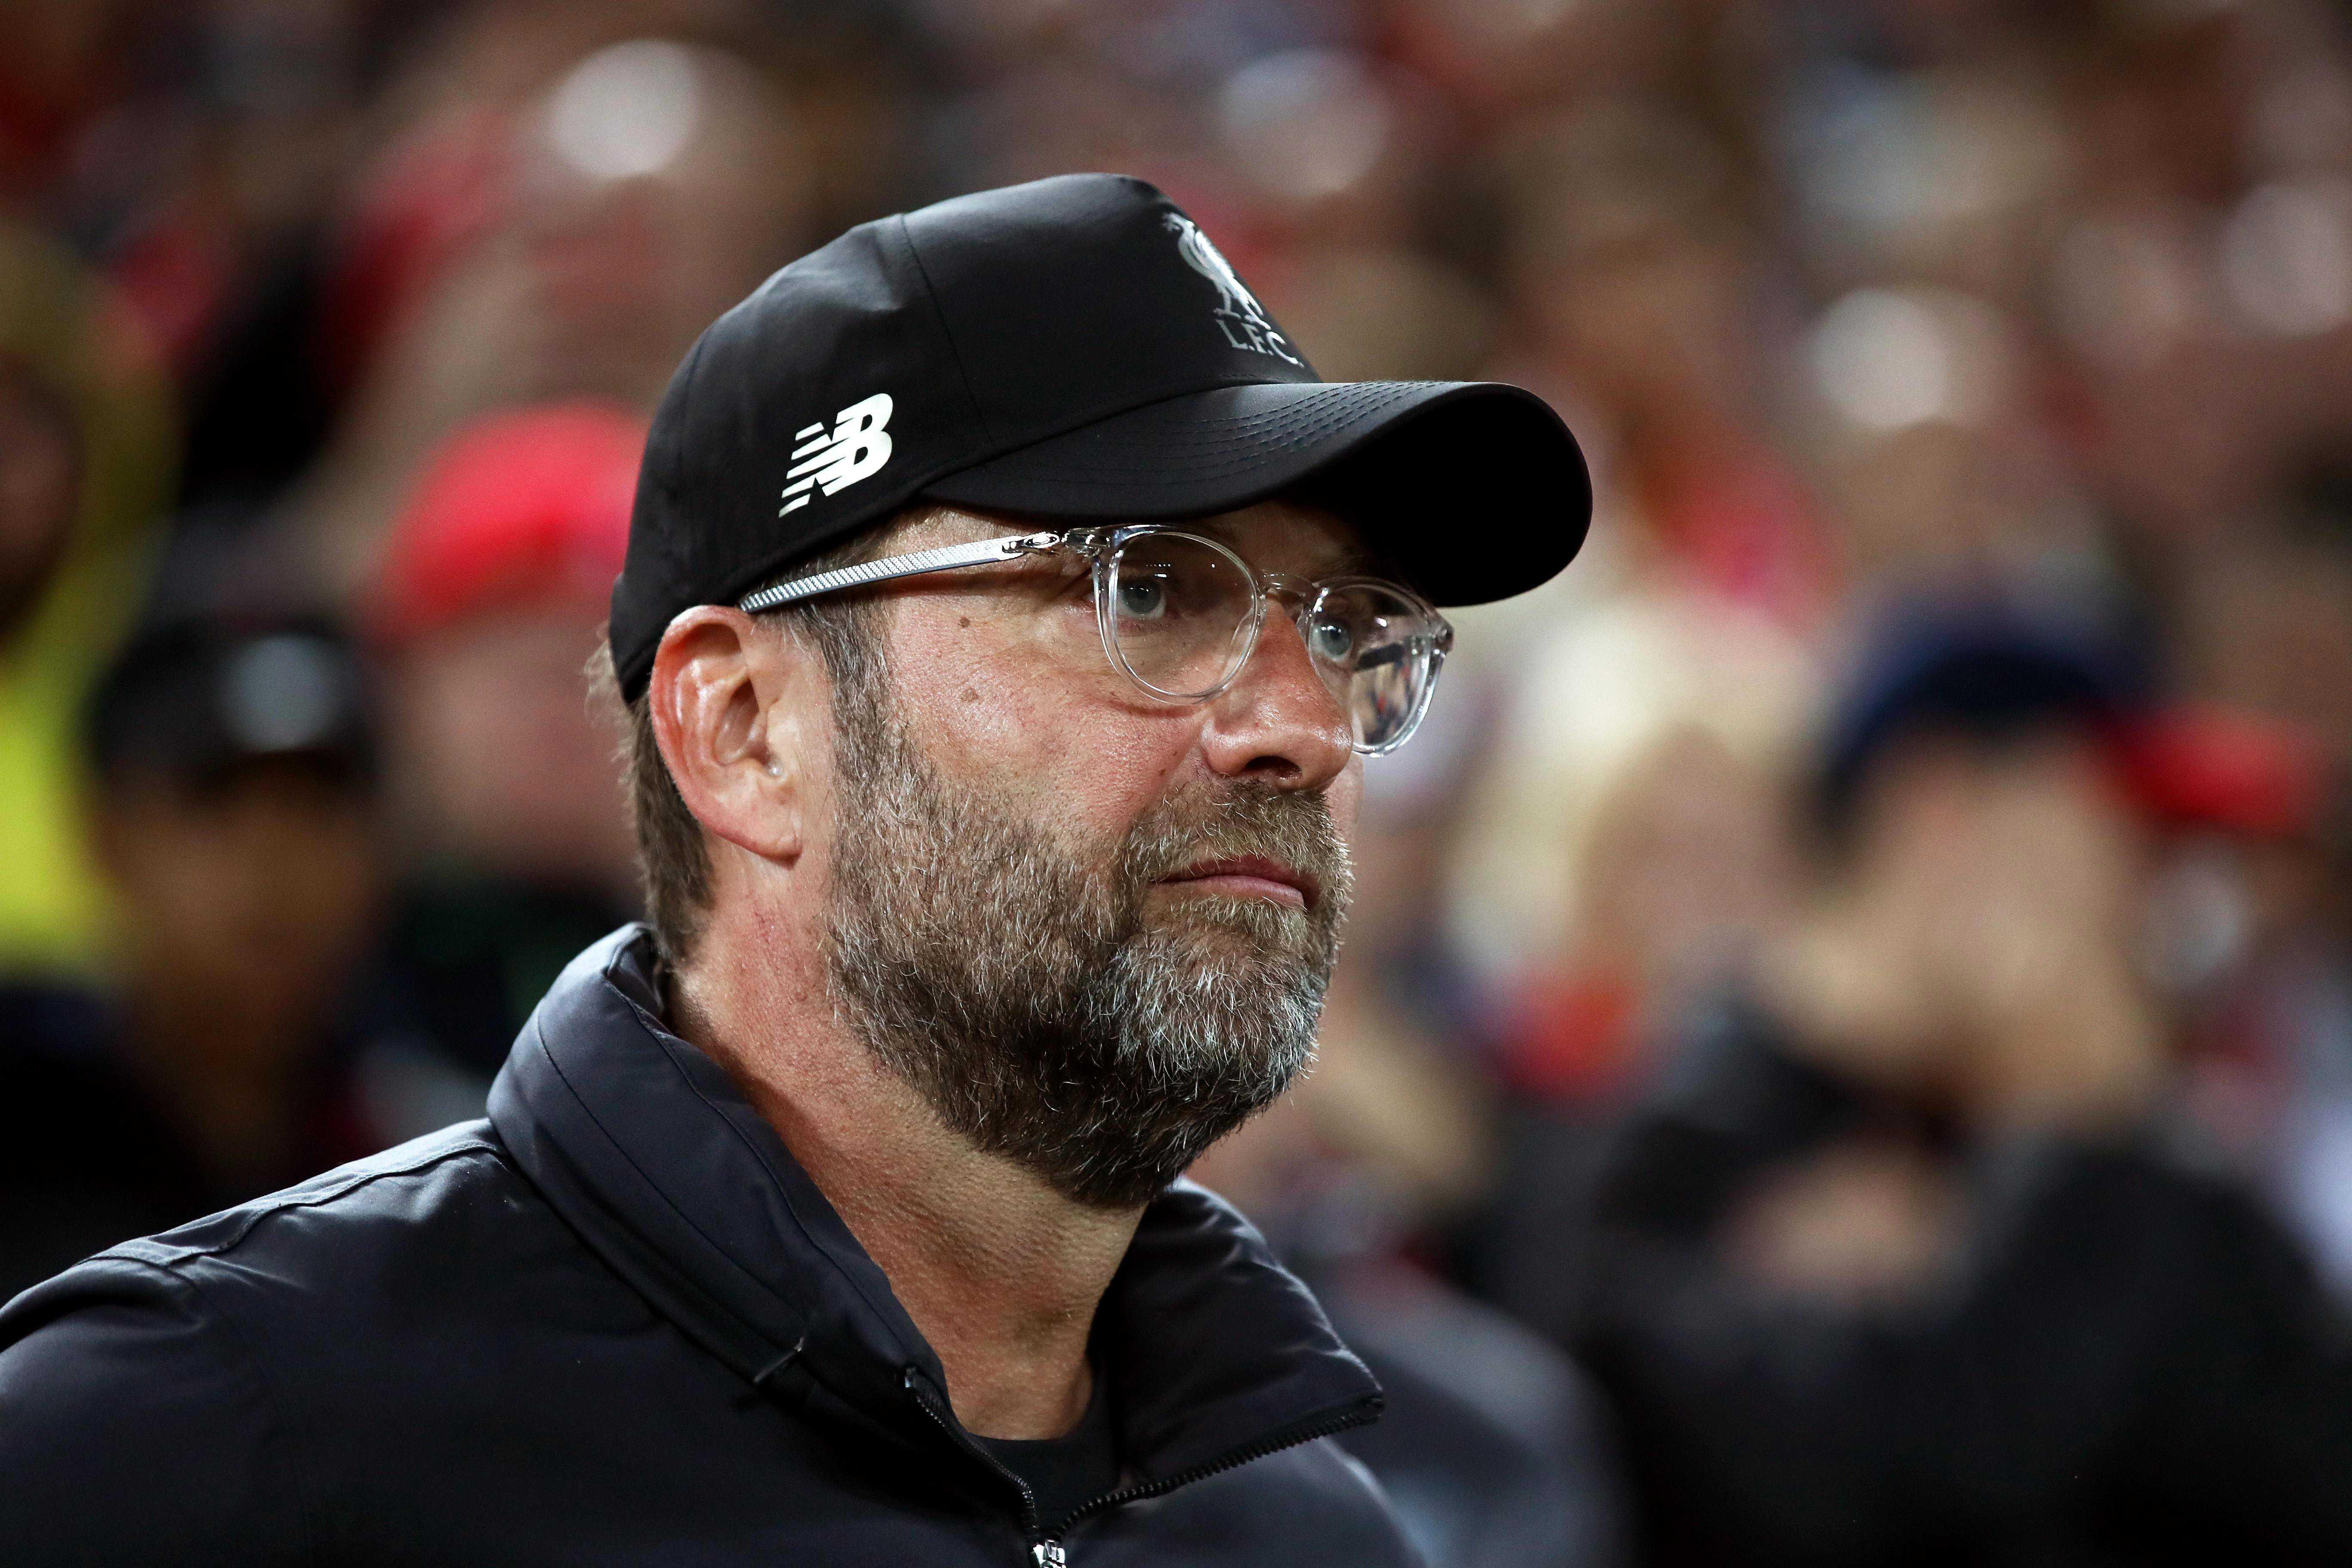 Scooper Football News Radio Comms Liverpool V Southampton Live